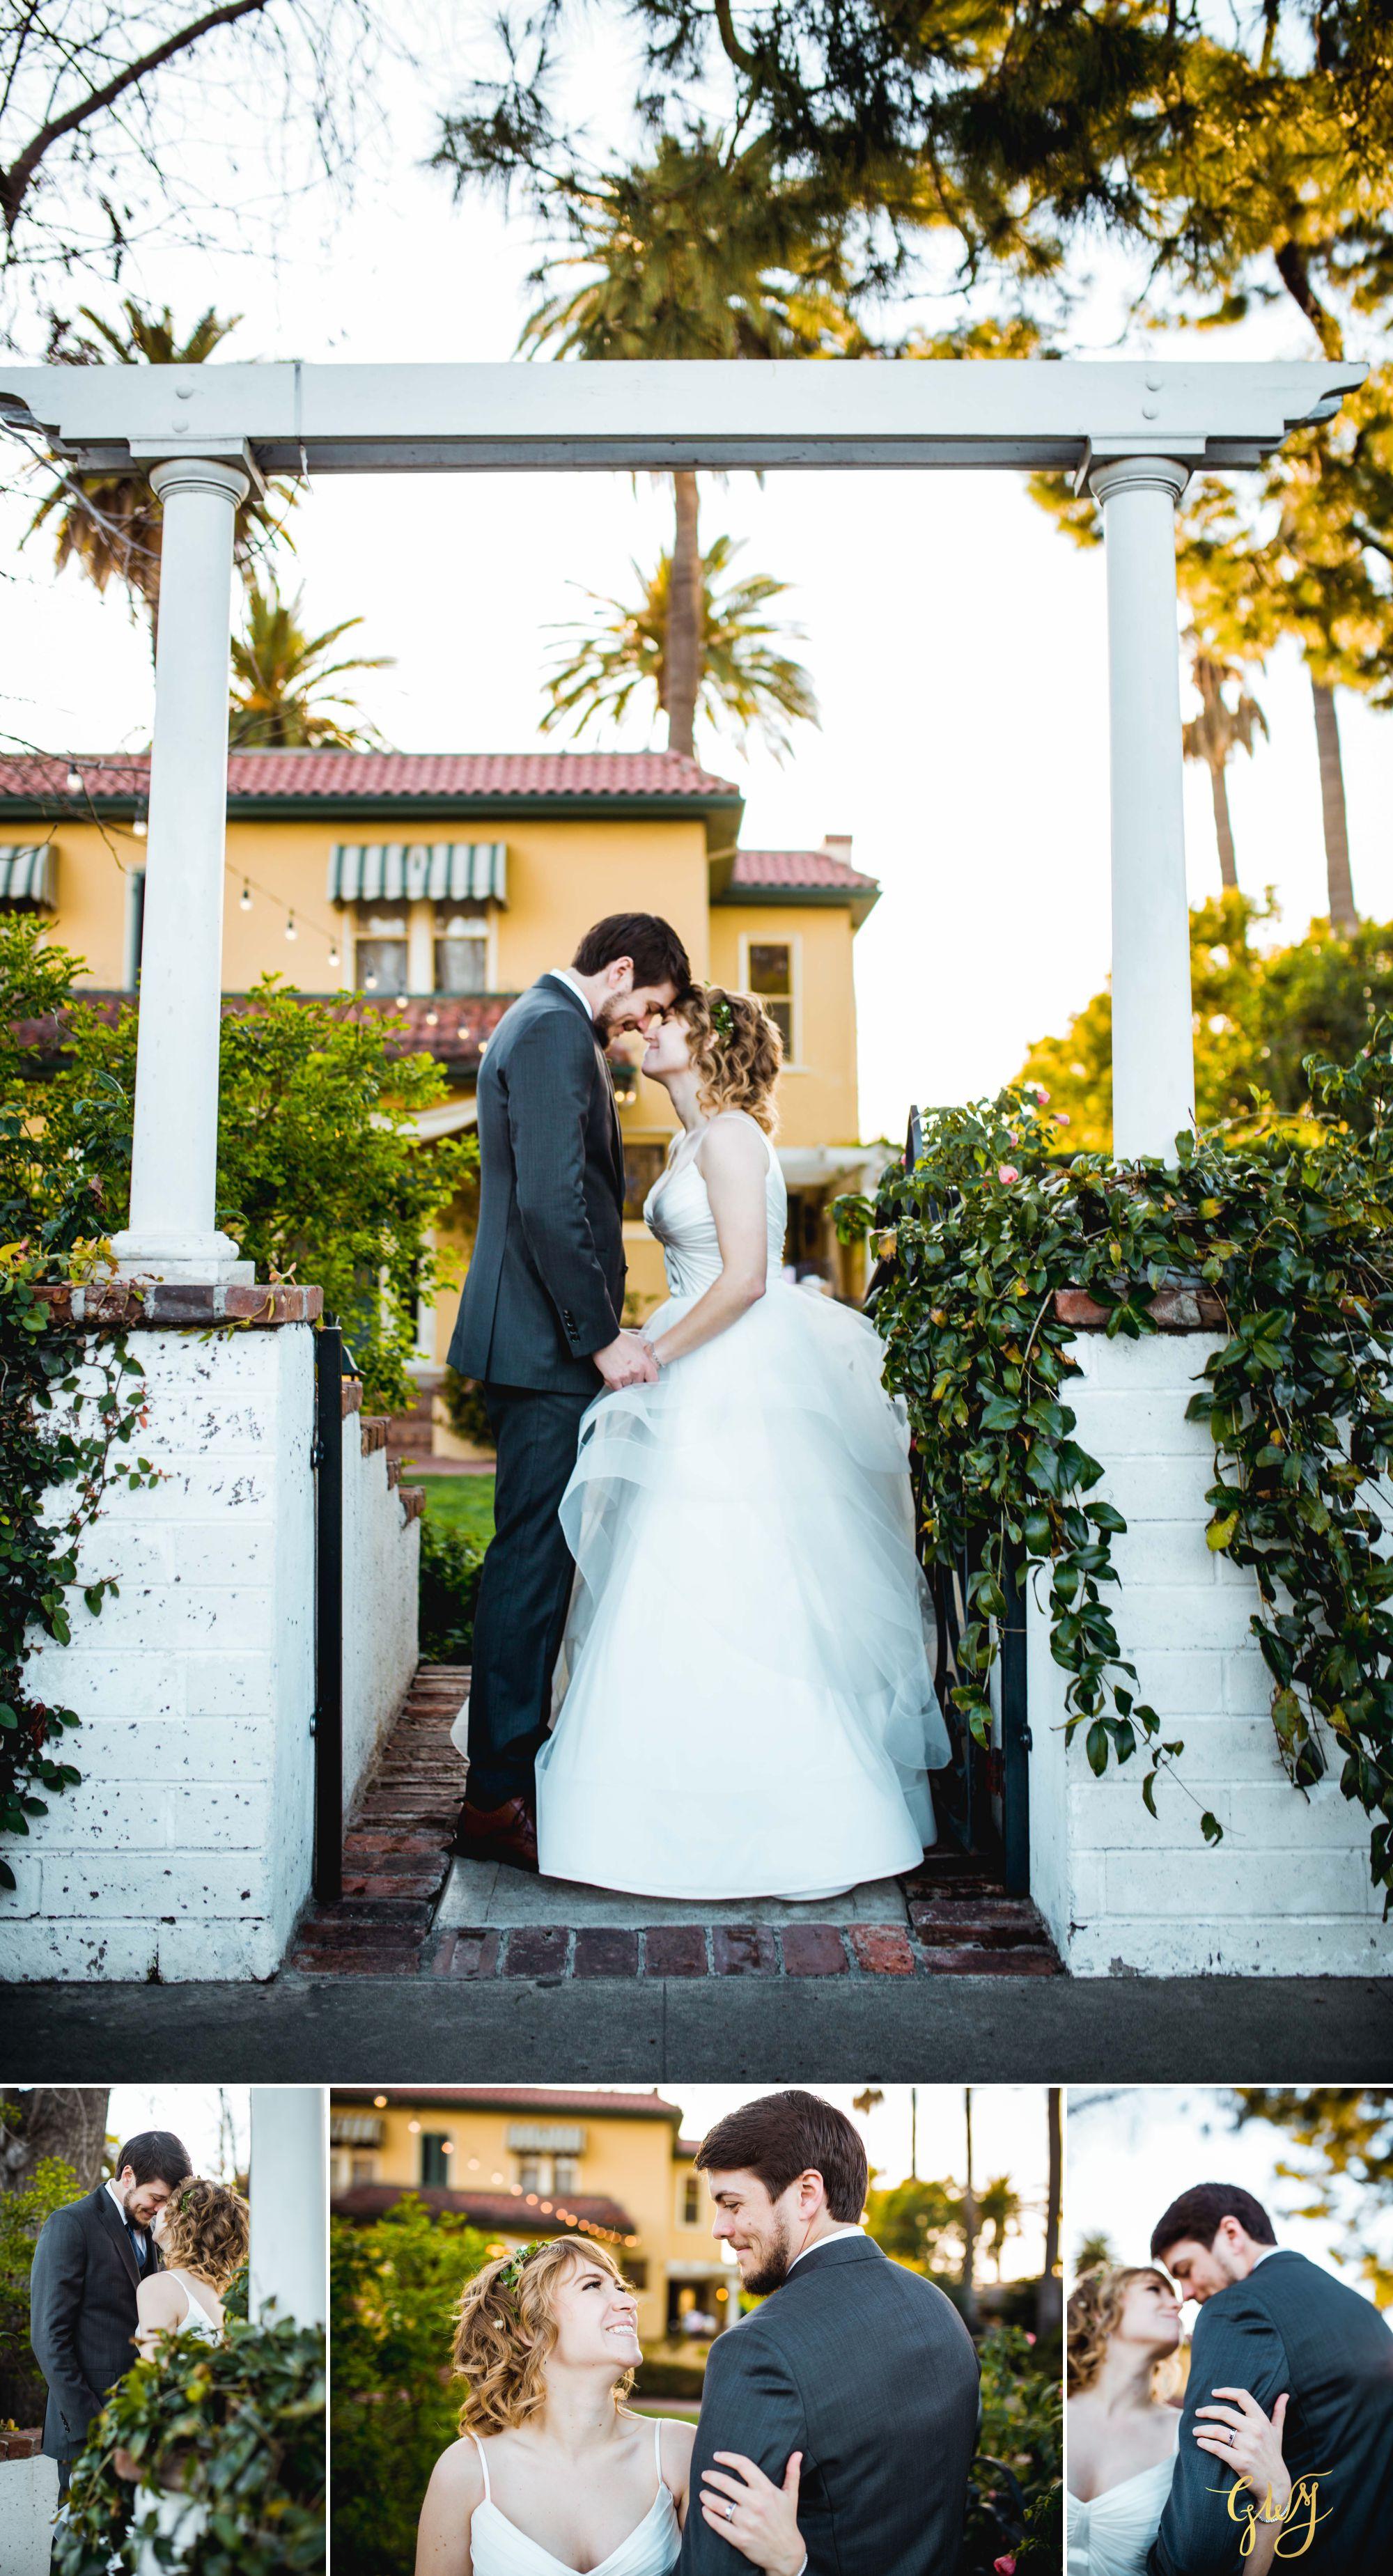 Garrett + Michelle's French Estate Orange County Spring Wedding by Glass Woods Media 38.jpg